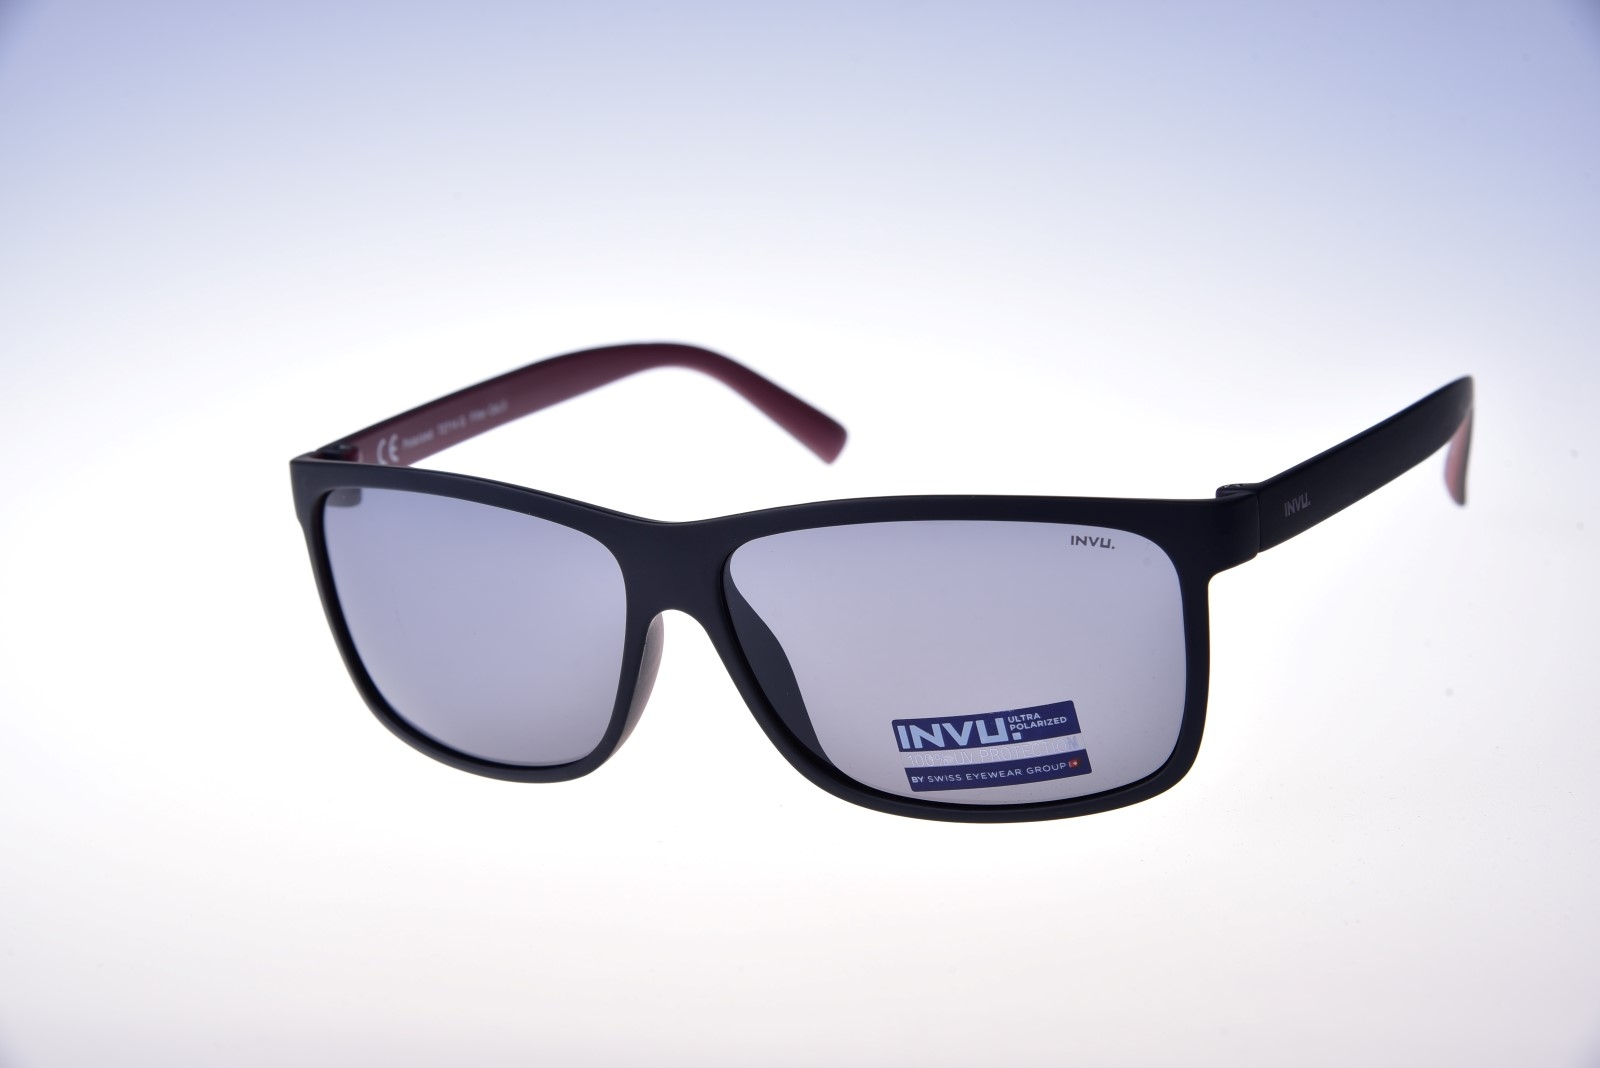 be62f78c4 INVU. Trend T2714G - Dámske, pánske a detské slnečné okuliare ...